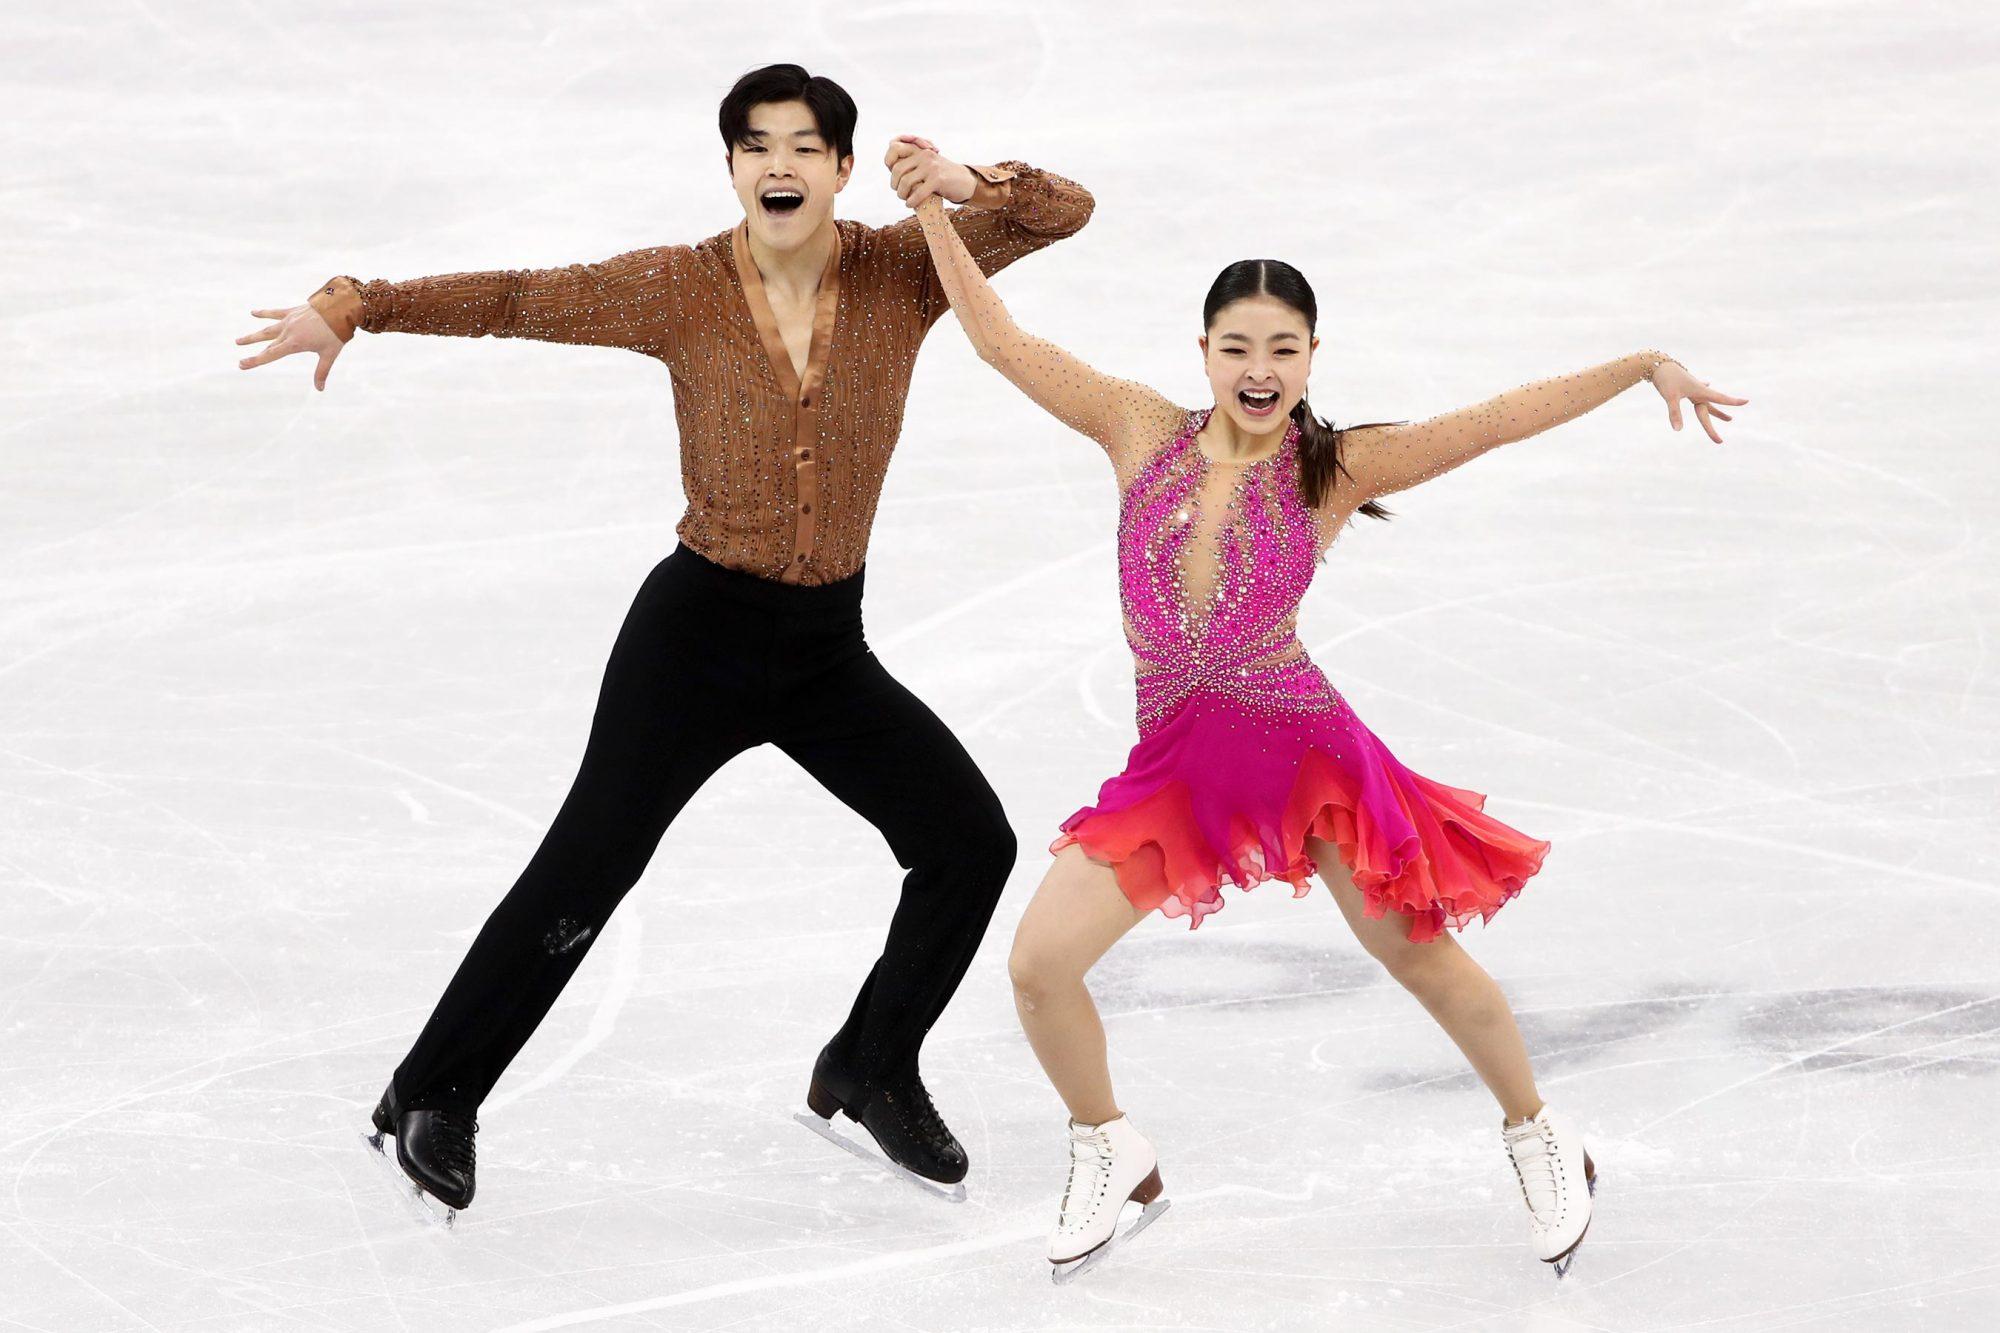 PyeongChang 2018 Olympics: figure skating, short dance